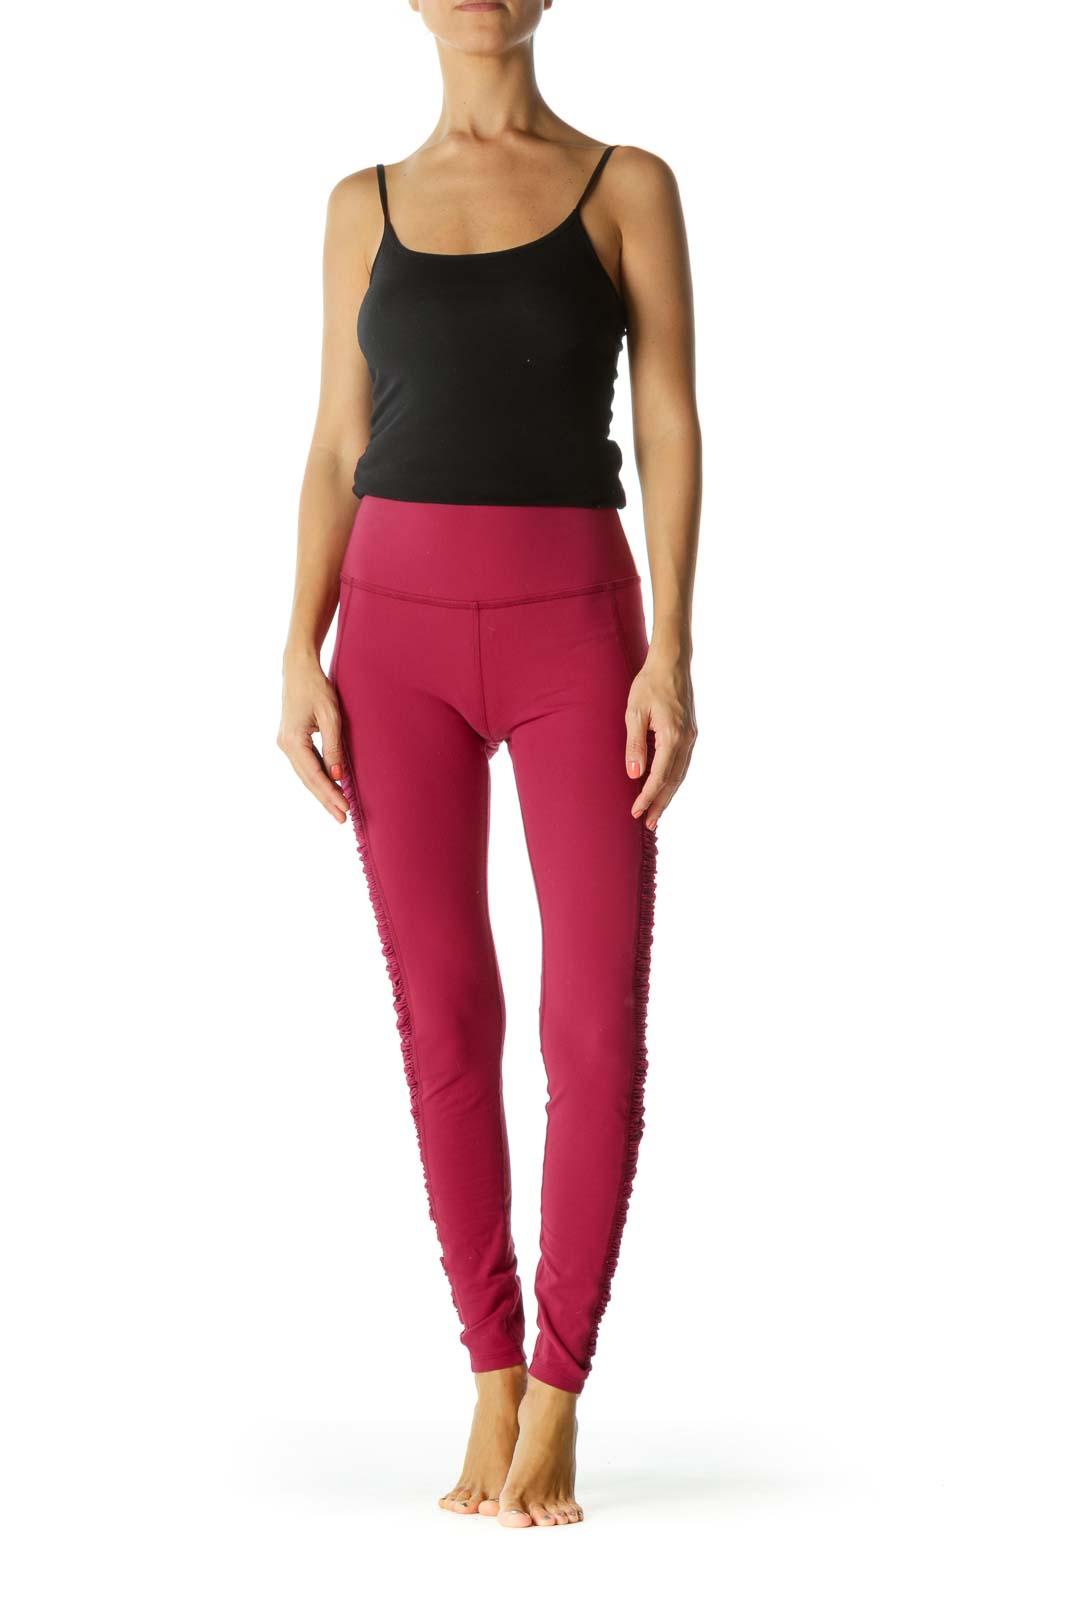 Magenta Burgundy Scrunch Leg Detail Mixed-Media Yoga Pants